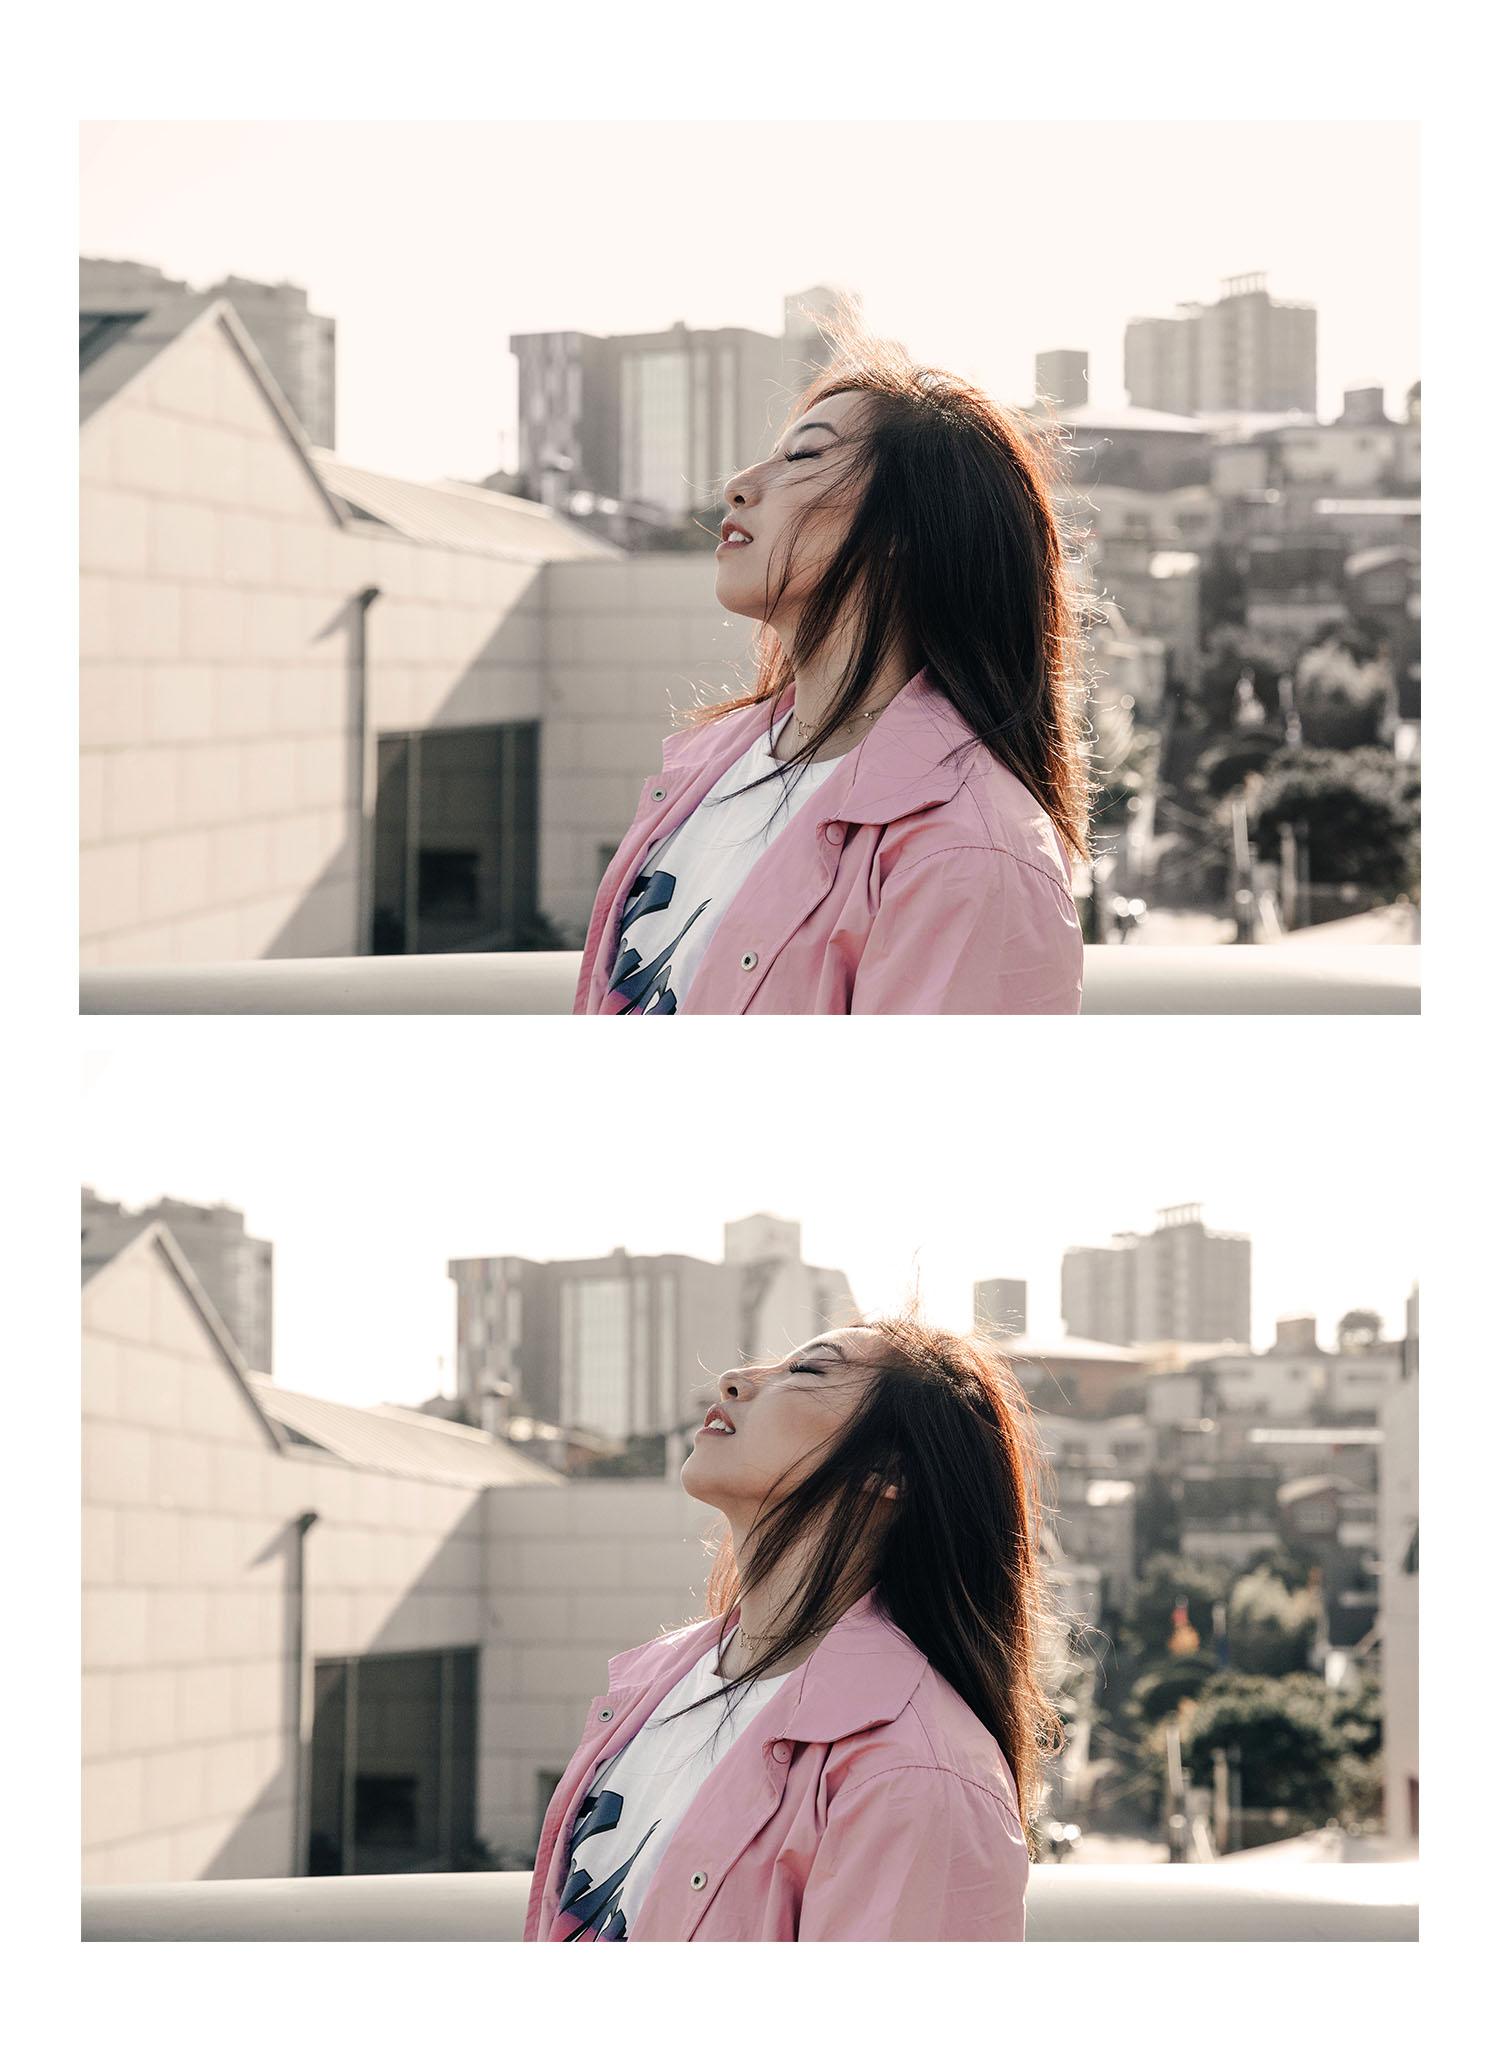 hayoung_kim_collage.jpg